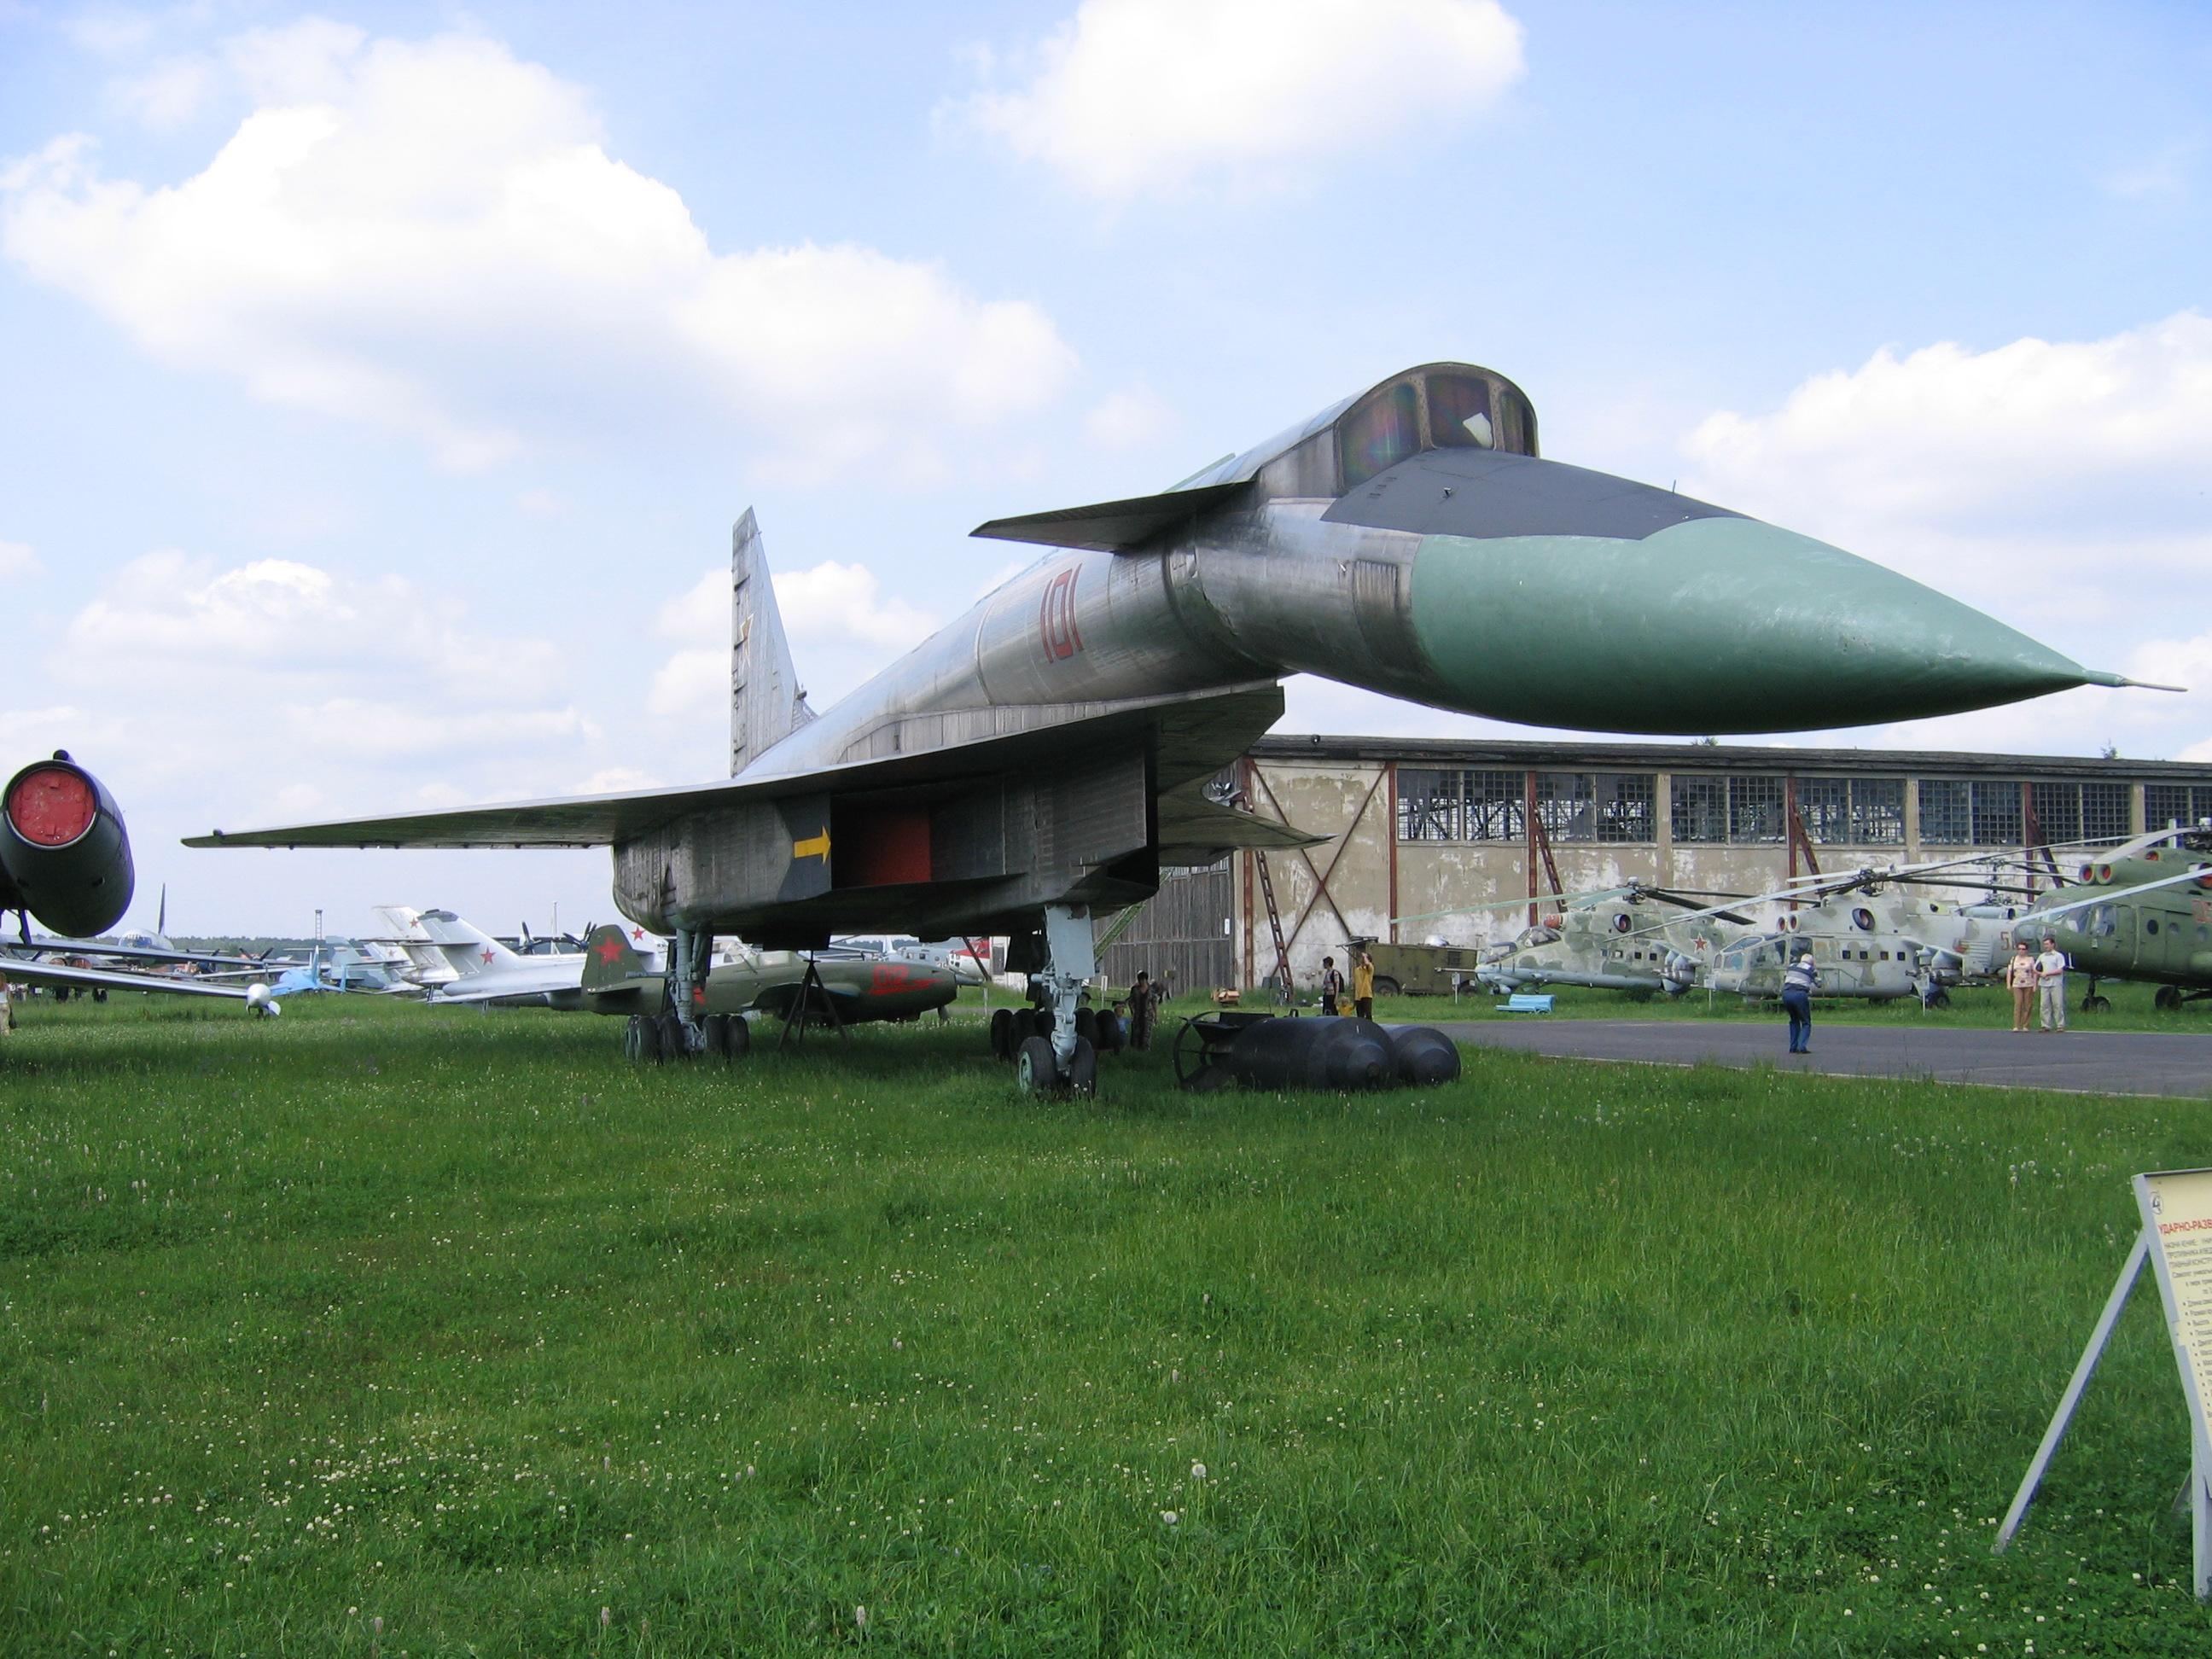 http://upload.wikimedia.org/wikipedia/commons/3/36/Sukhoi_T-4_(Monino_museum).JPG